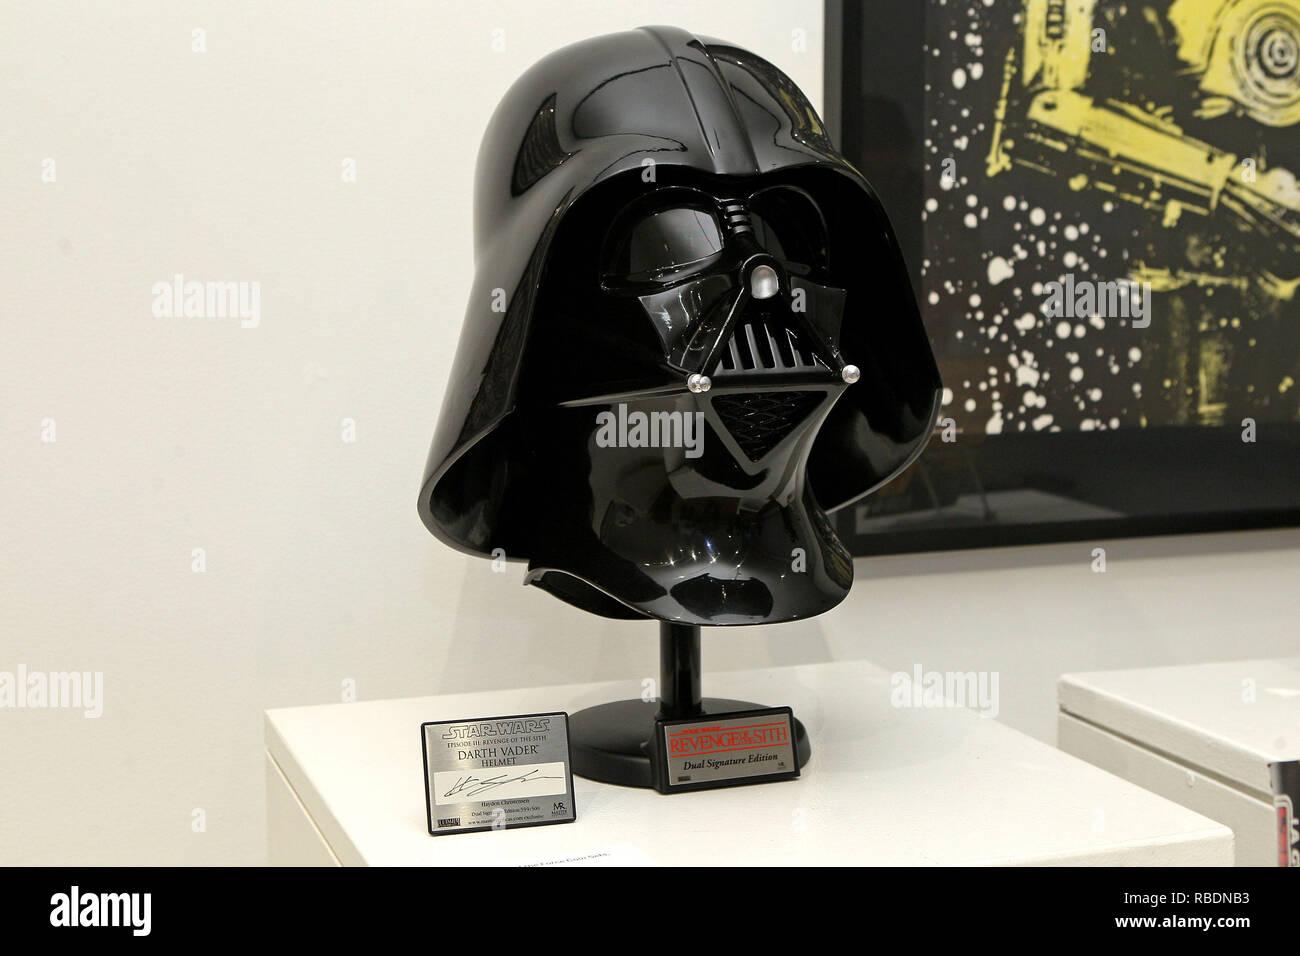 New York Ny December 02 Signed Star Wars Revenge Of The Sith Darth Vader Helmet On